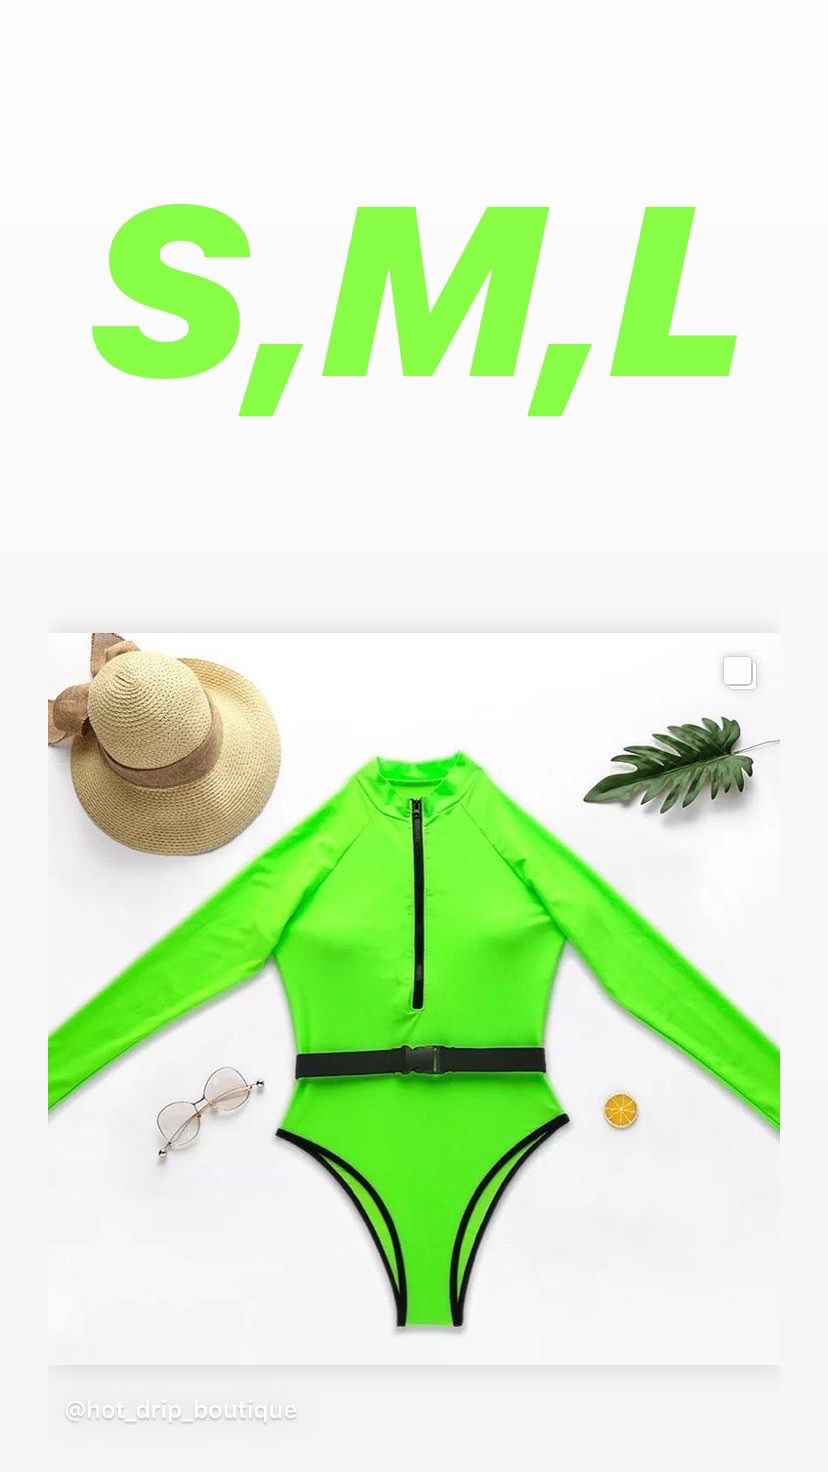 Neon Swim suit